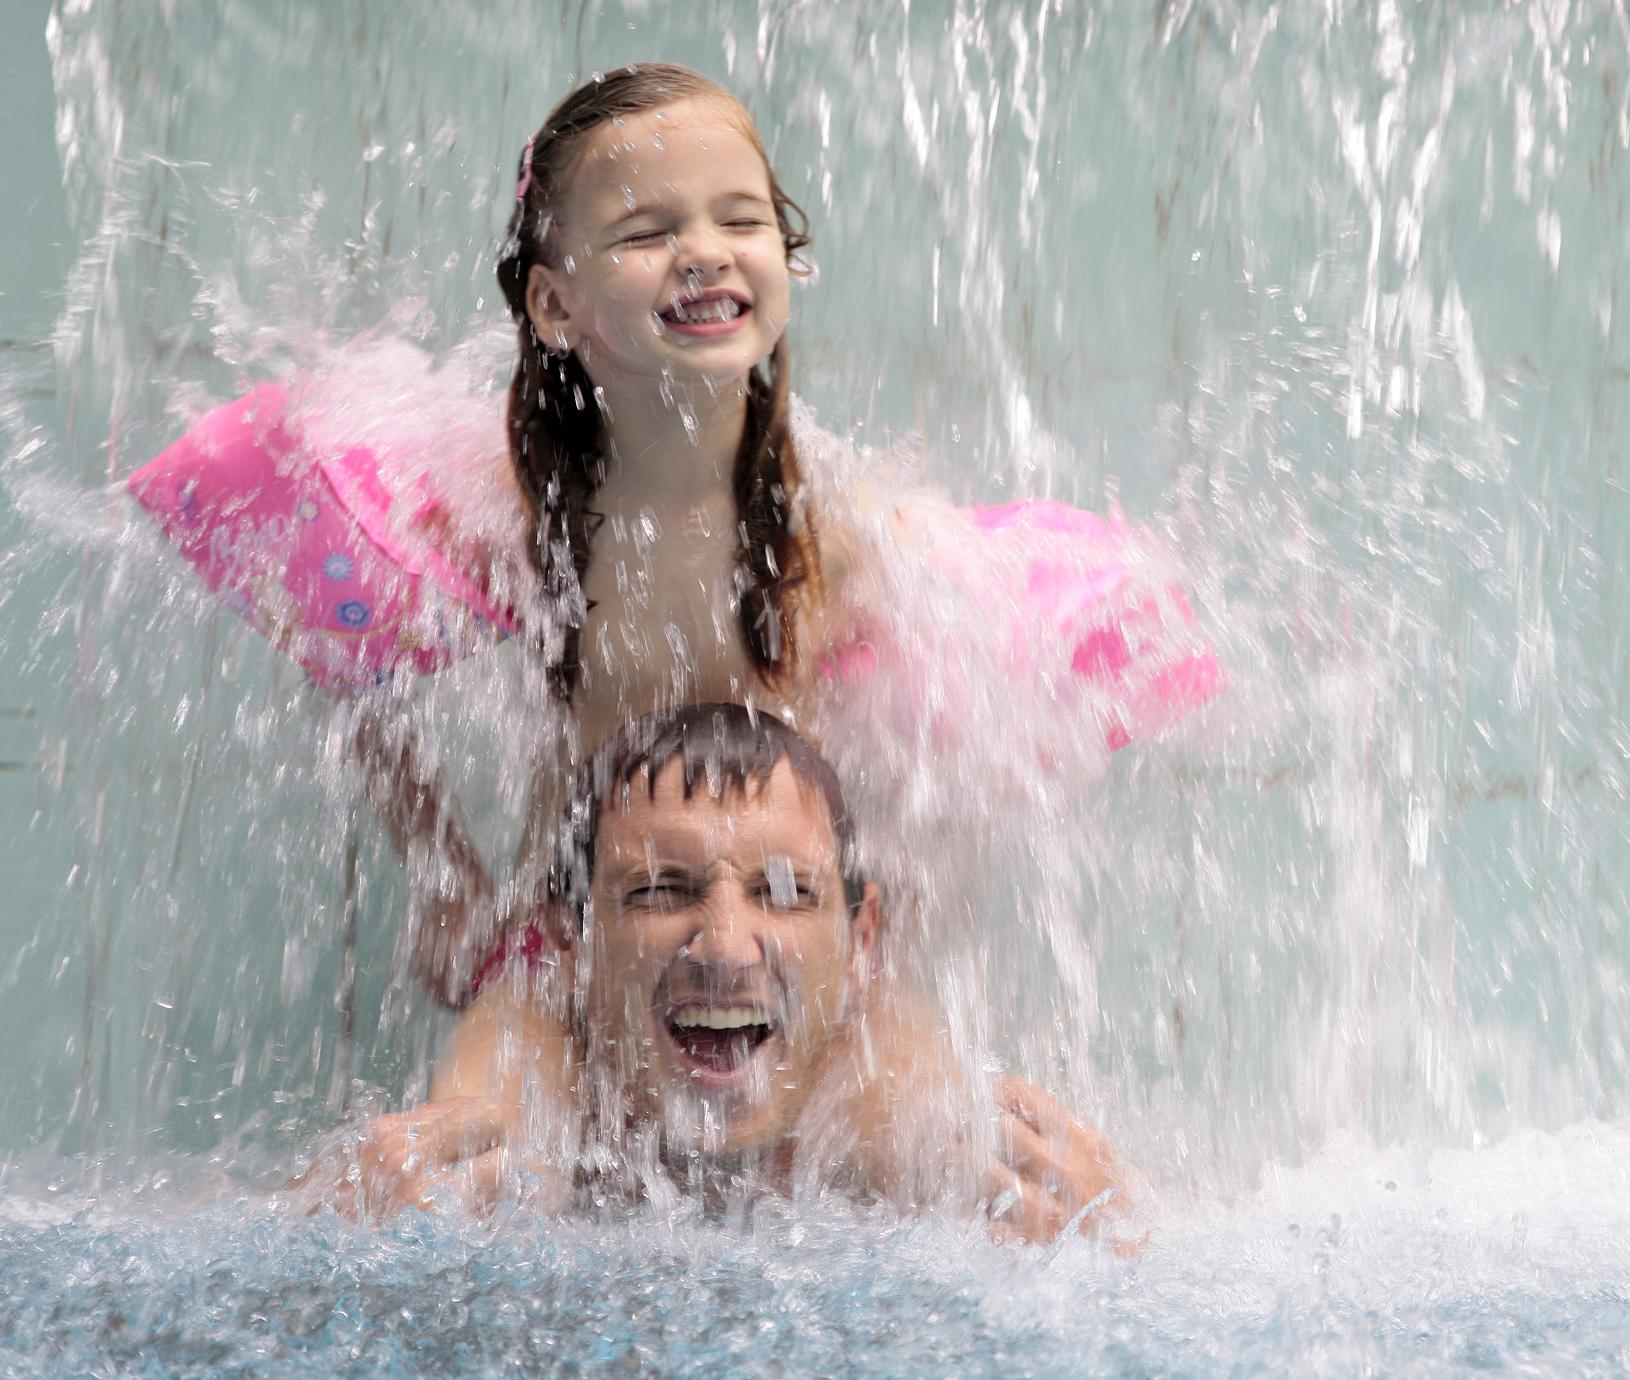 Aquapark - fun